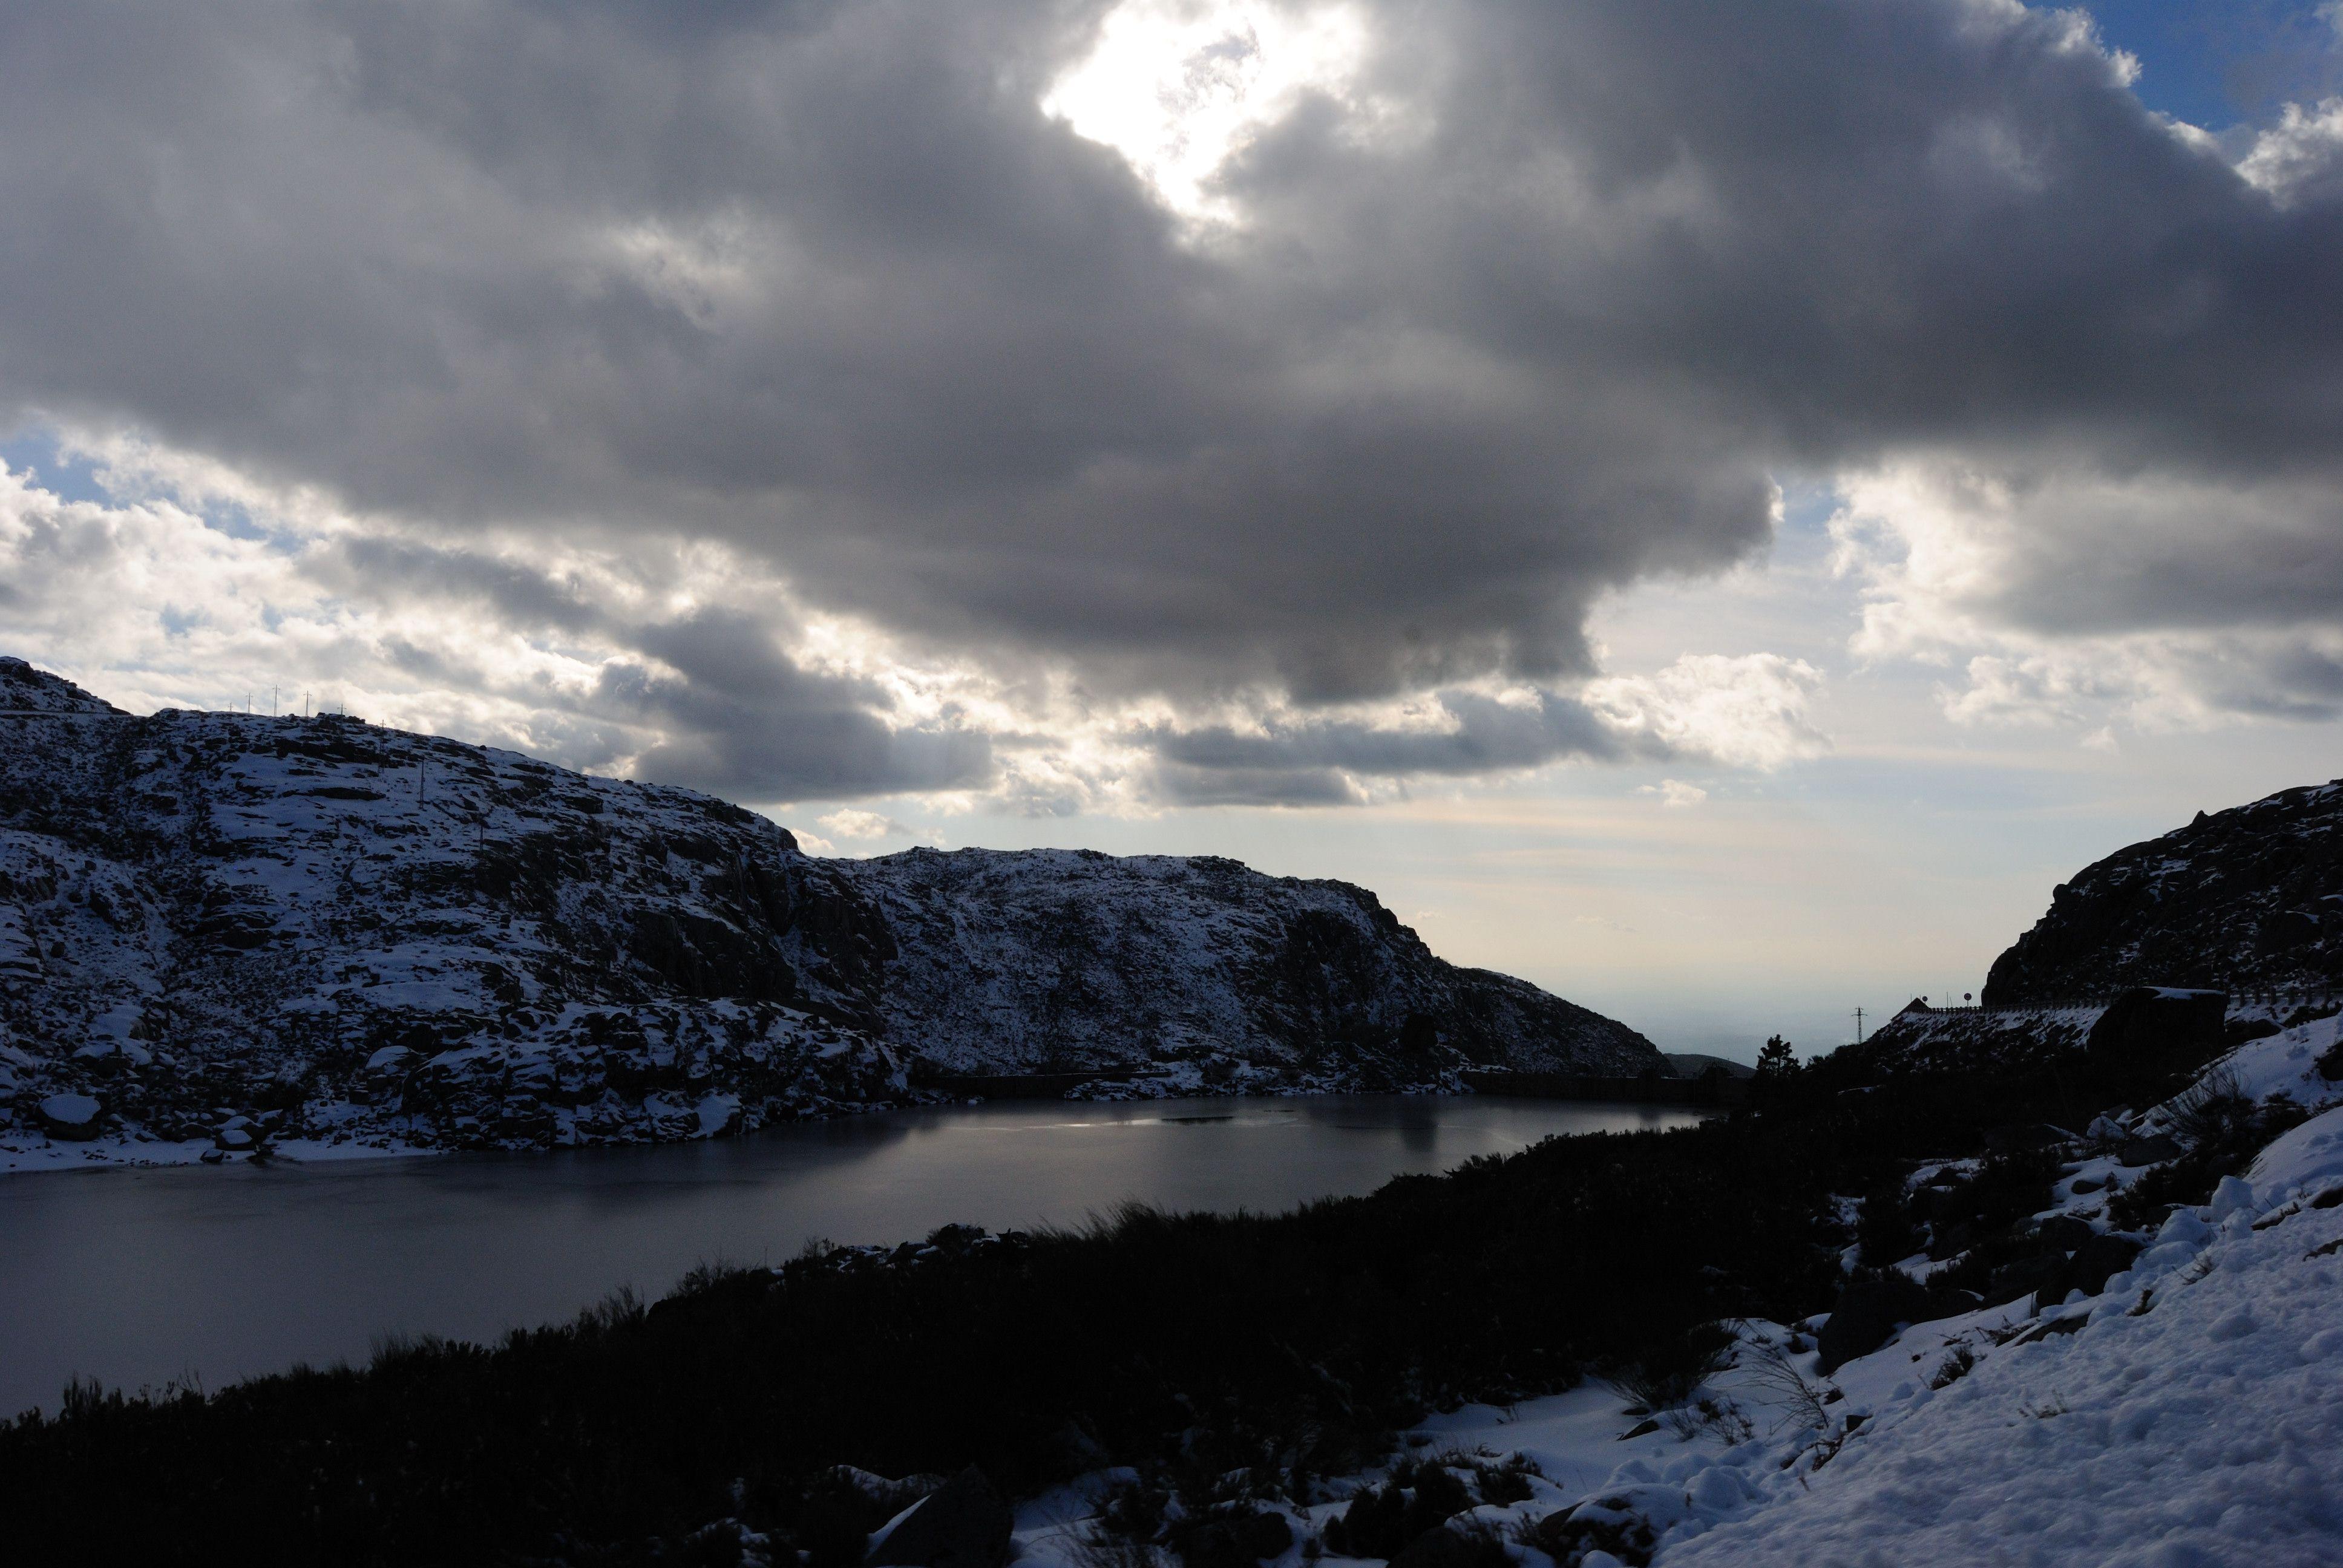 Serra da Estrela